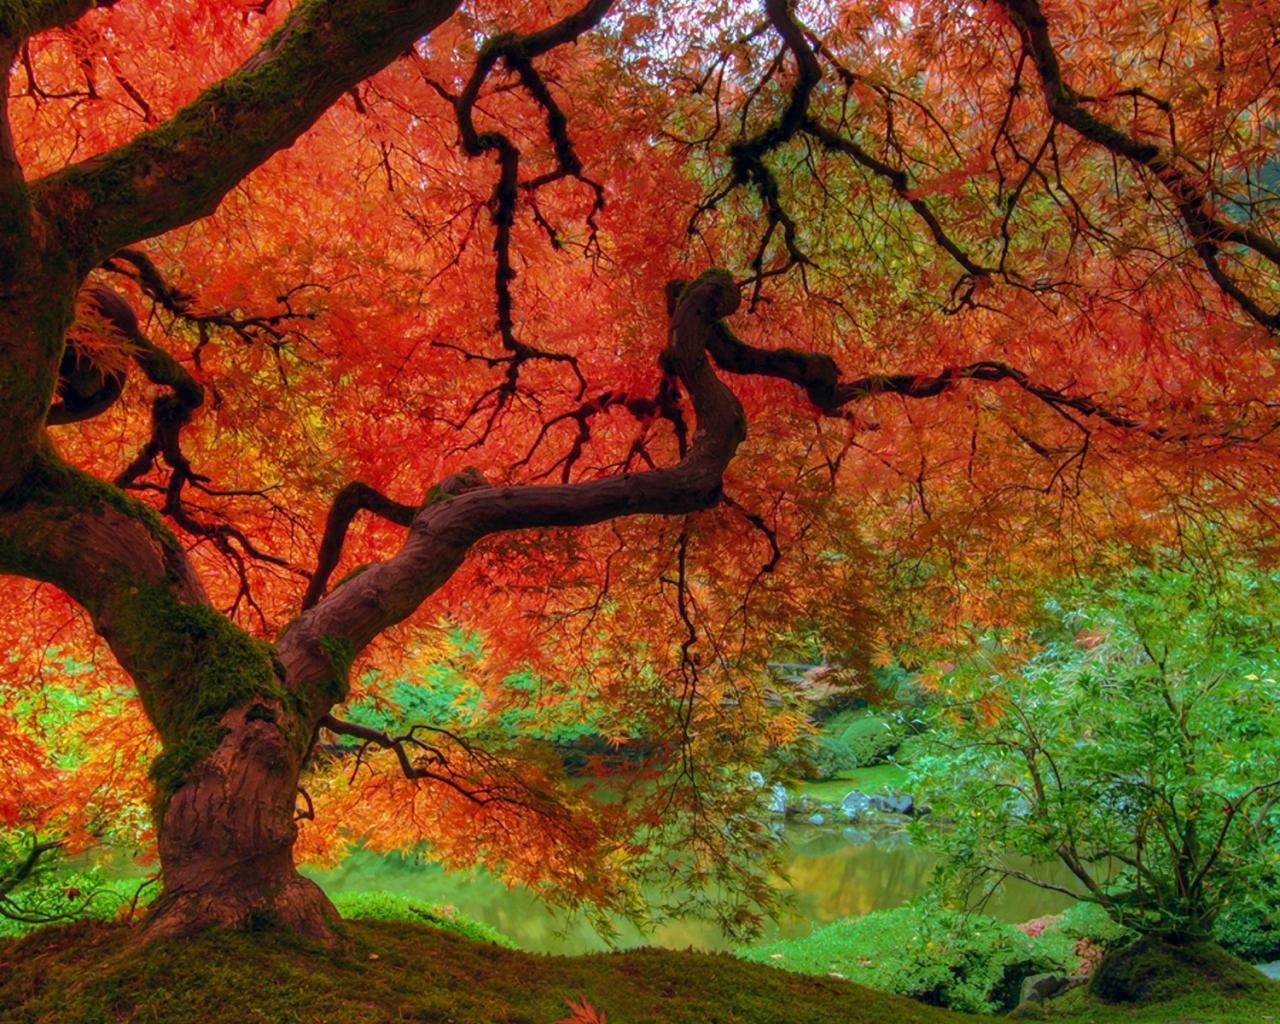 Otoño colorido - 1280x1024